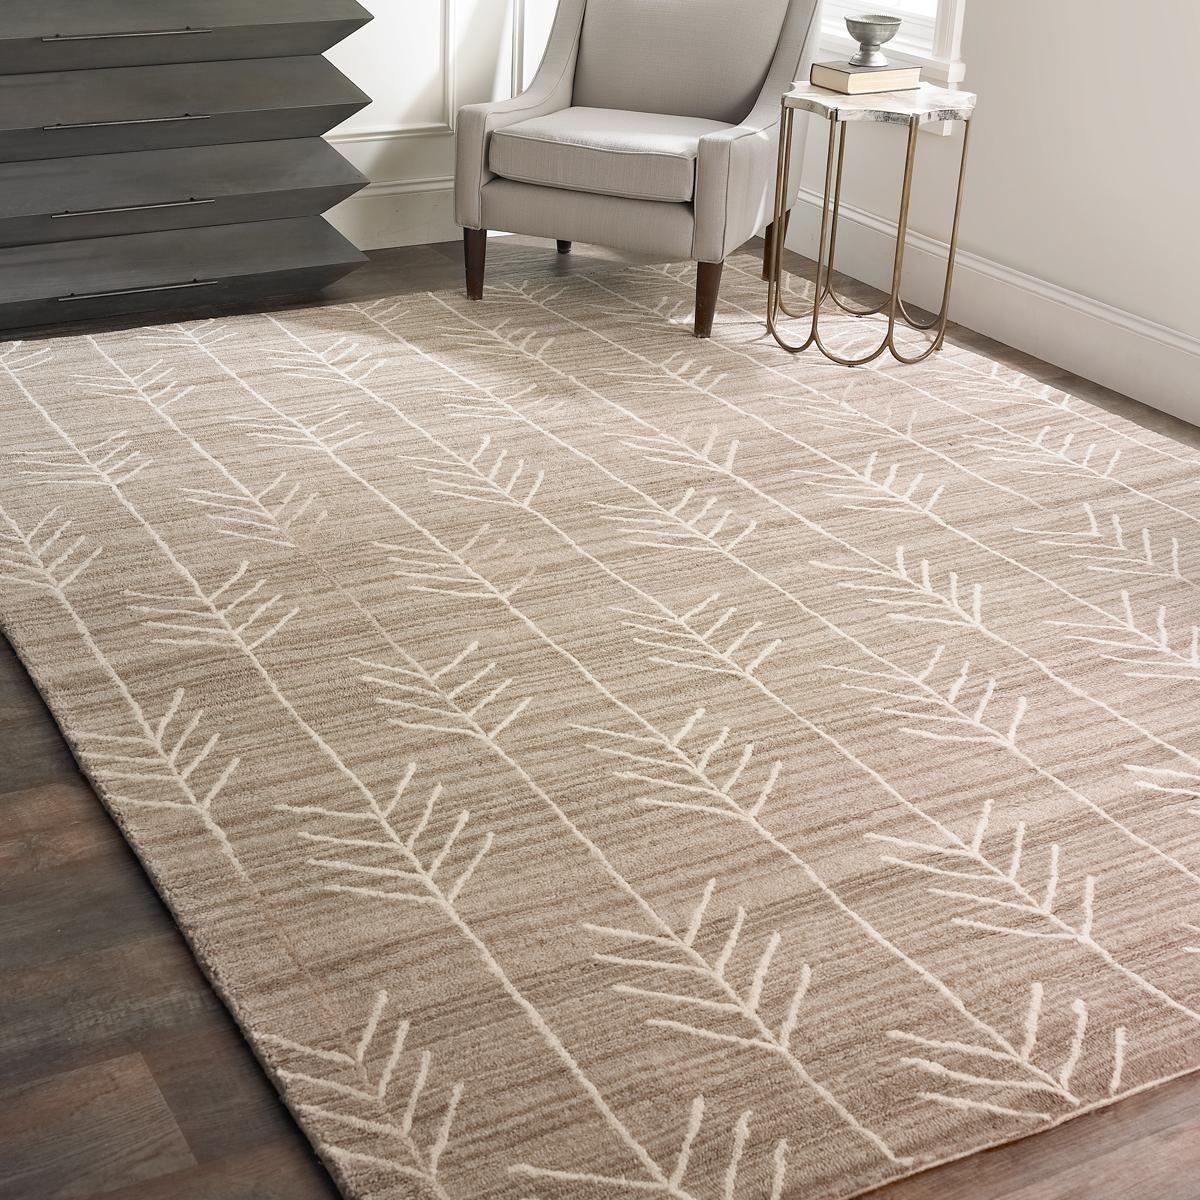 Best 25 Rustic rugs ideas on Pinterest  Rustic area rugs